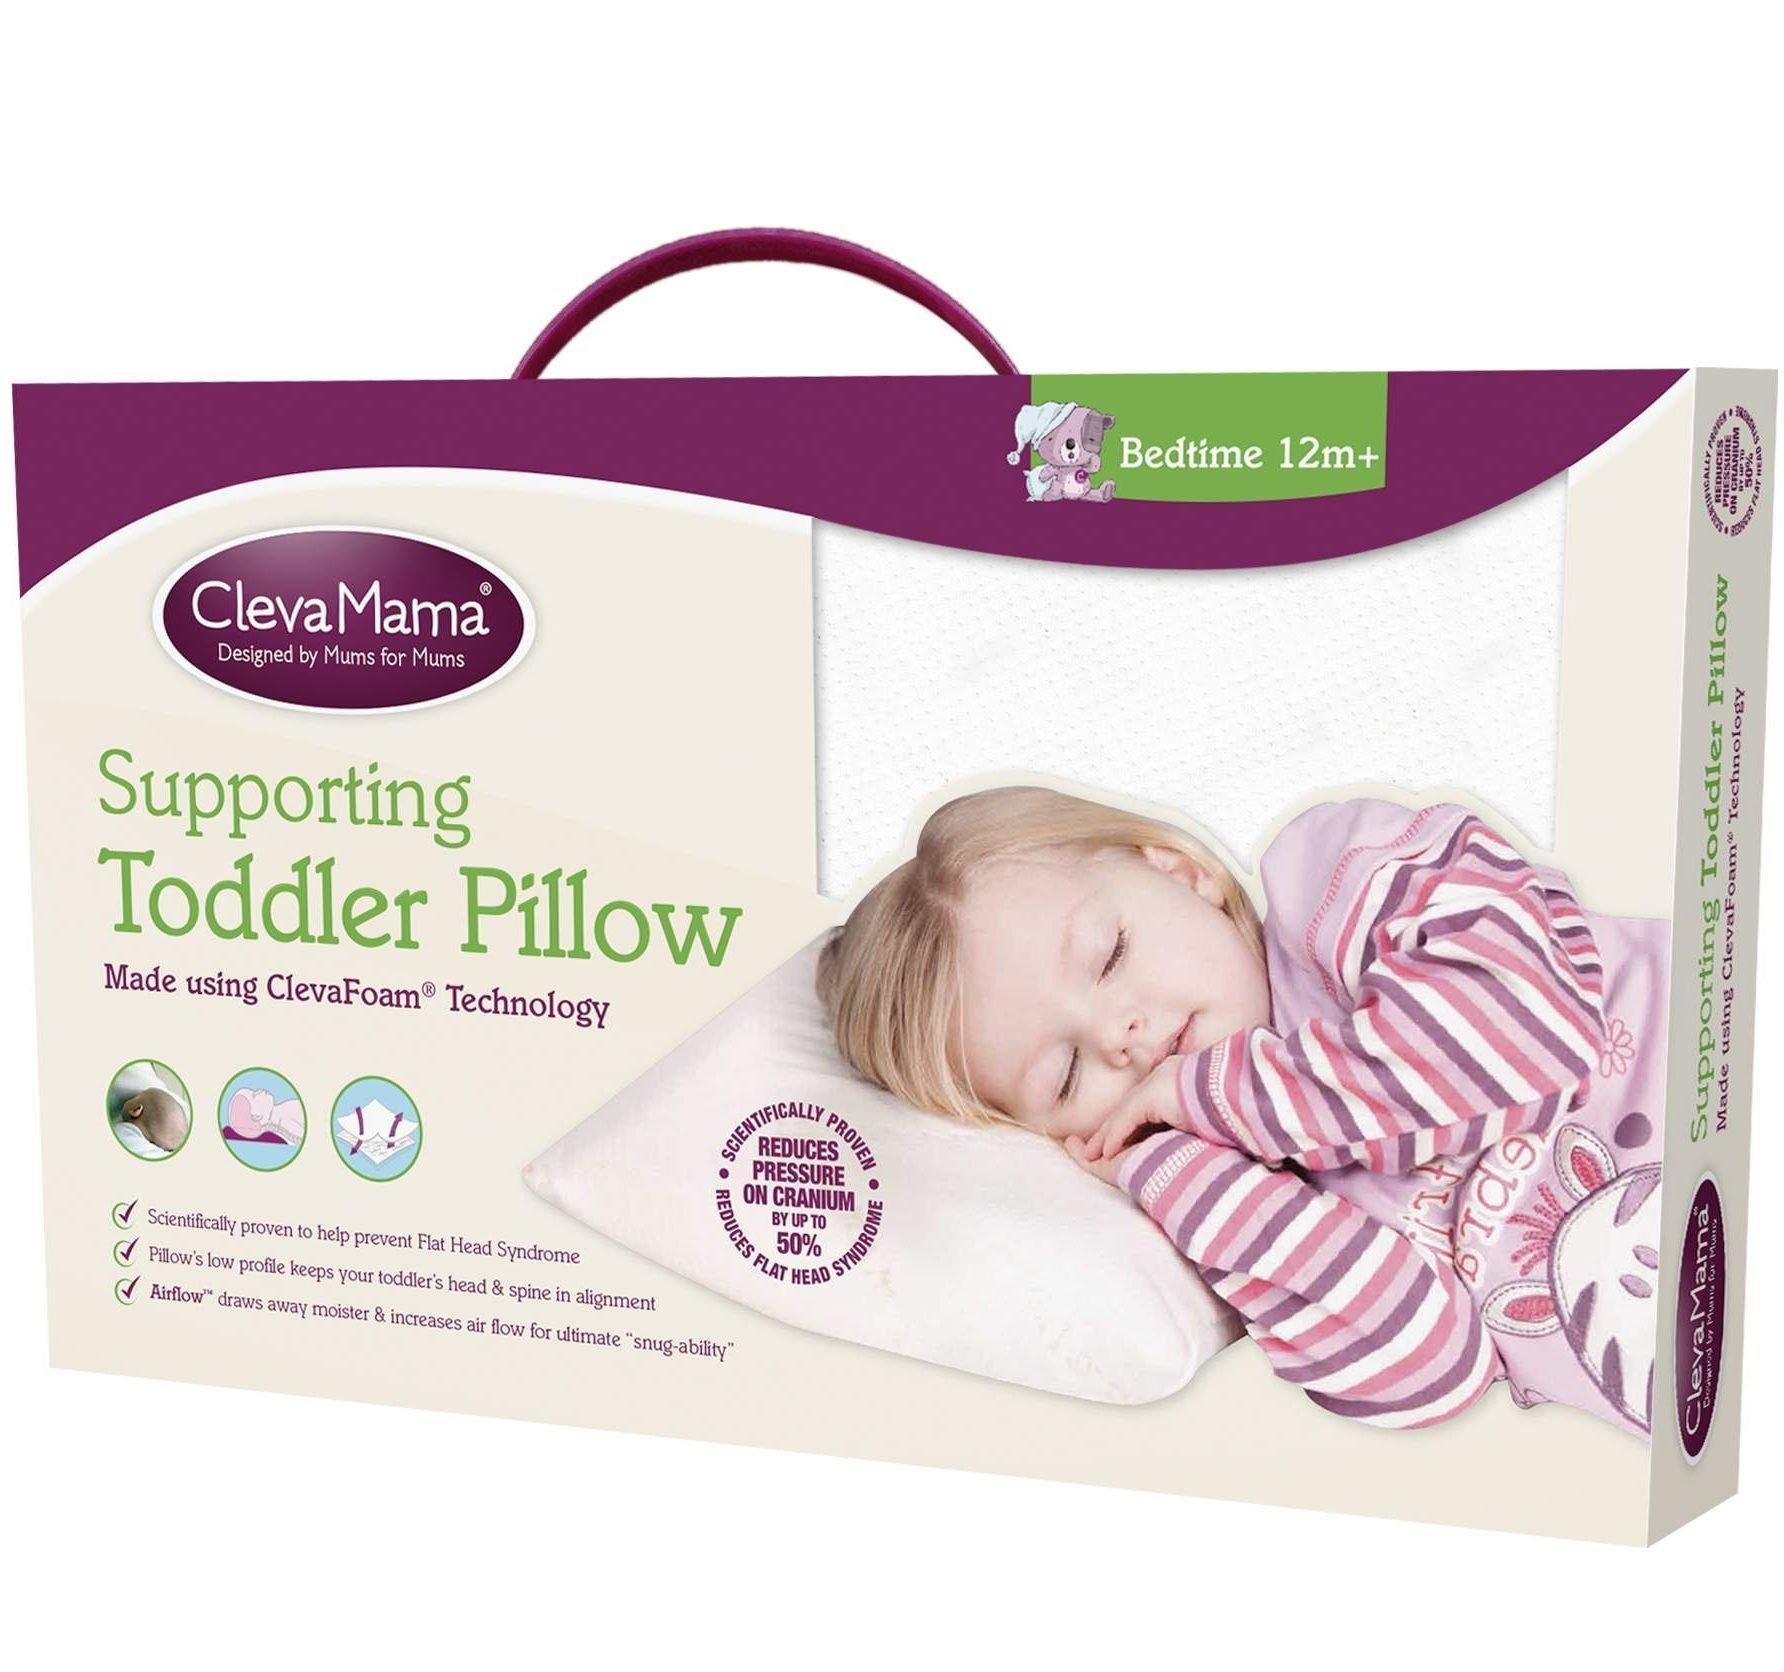 ClevaMama Cleva Foam Toddler Pillow